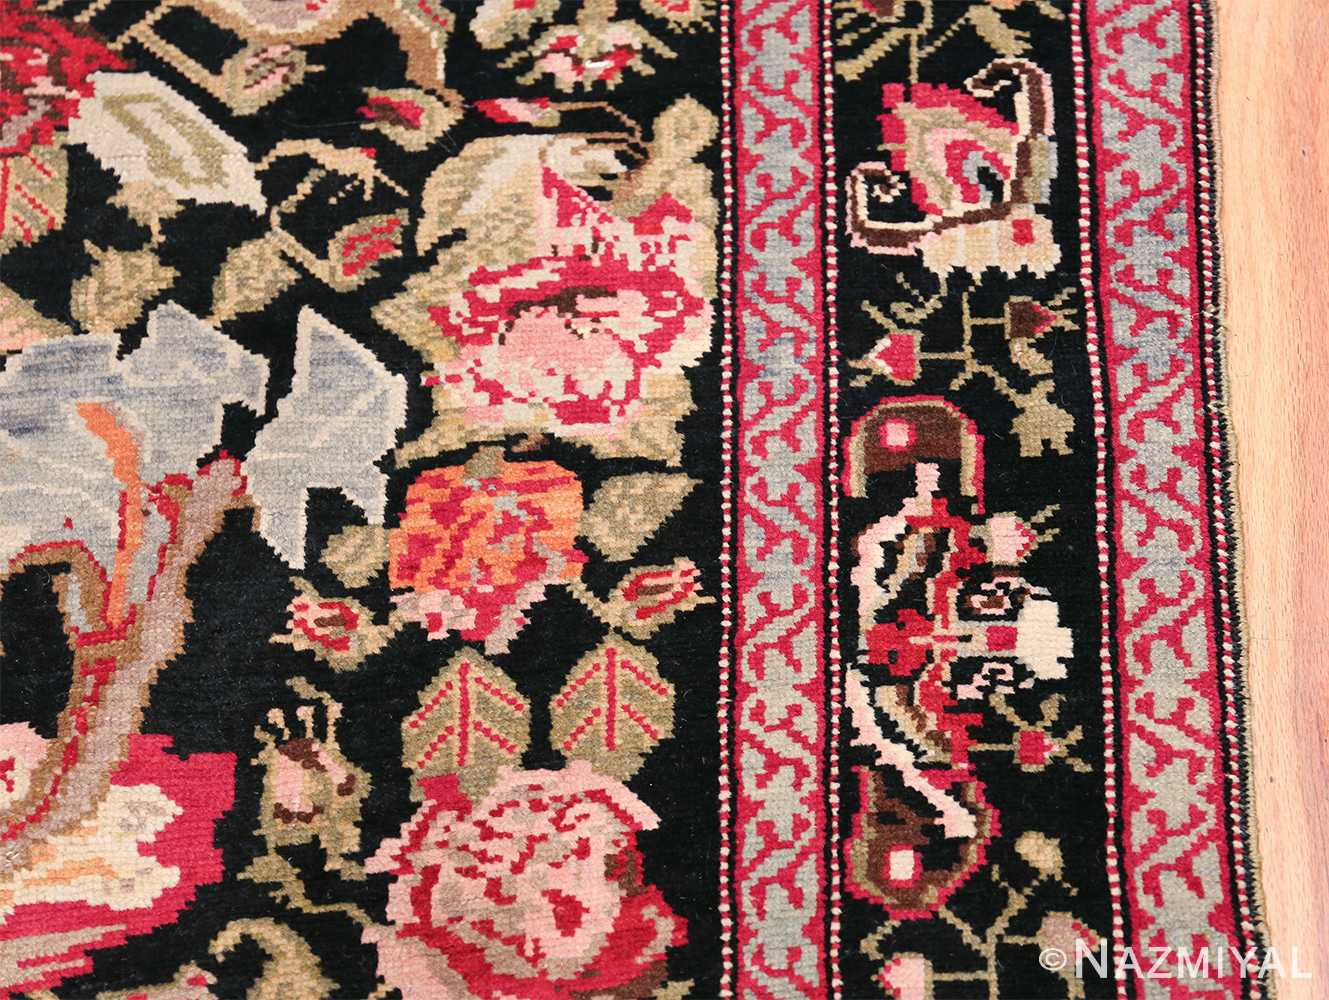 Antique Caucasian Karabagh Runner Rug 48149 Border Design Nazmiyal